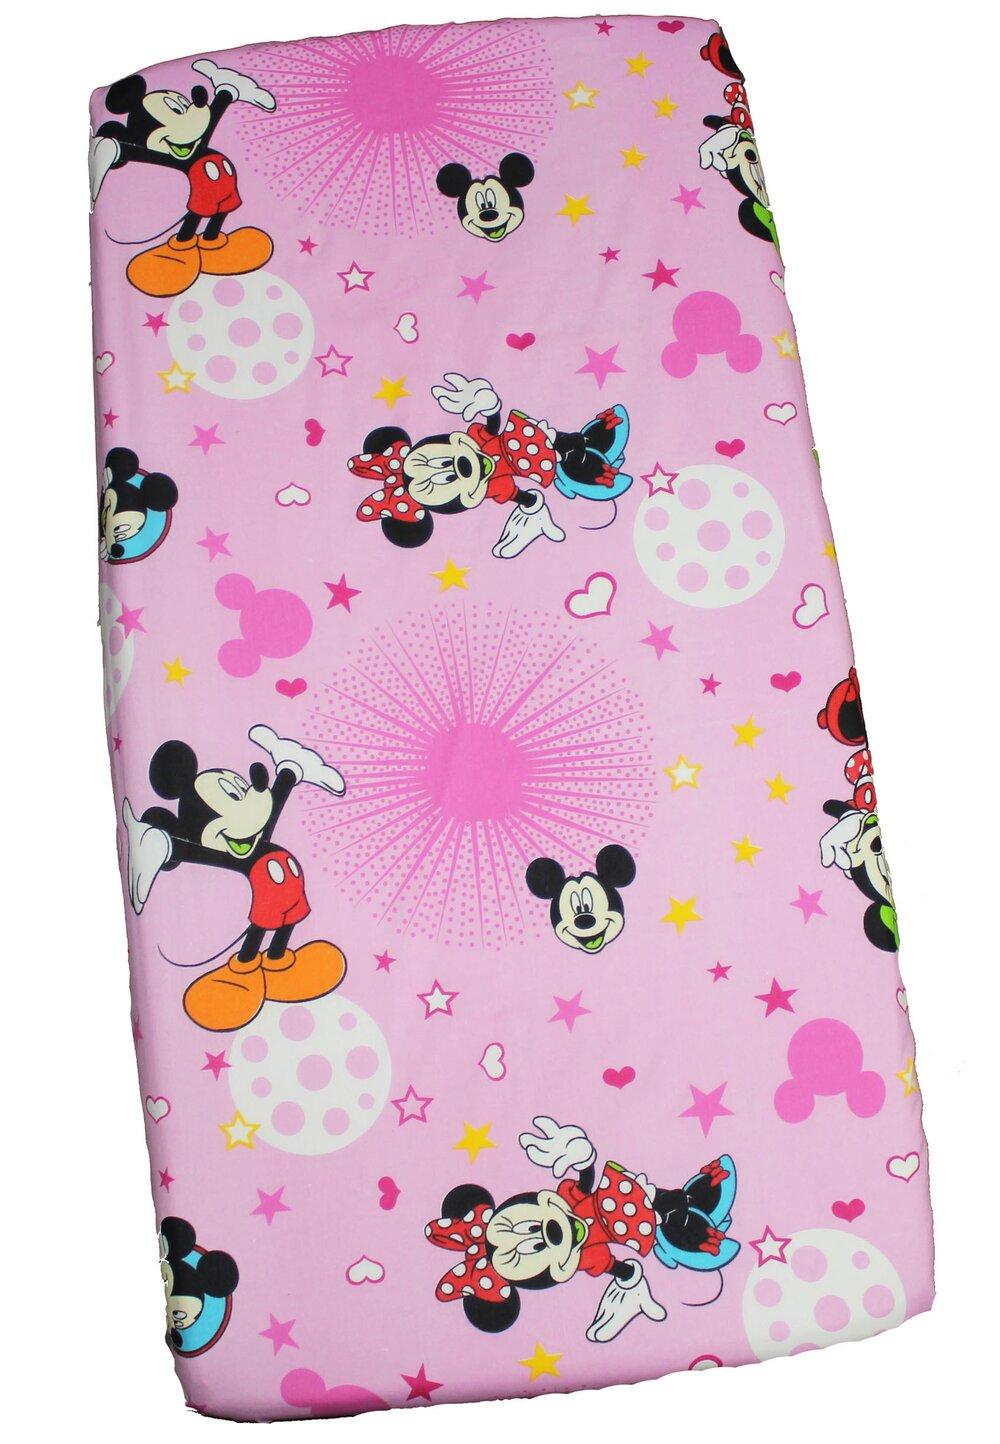 Cearceaf Minnie si Mickey, roz cu stelute, 120 x 60 cm imagine